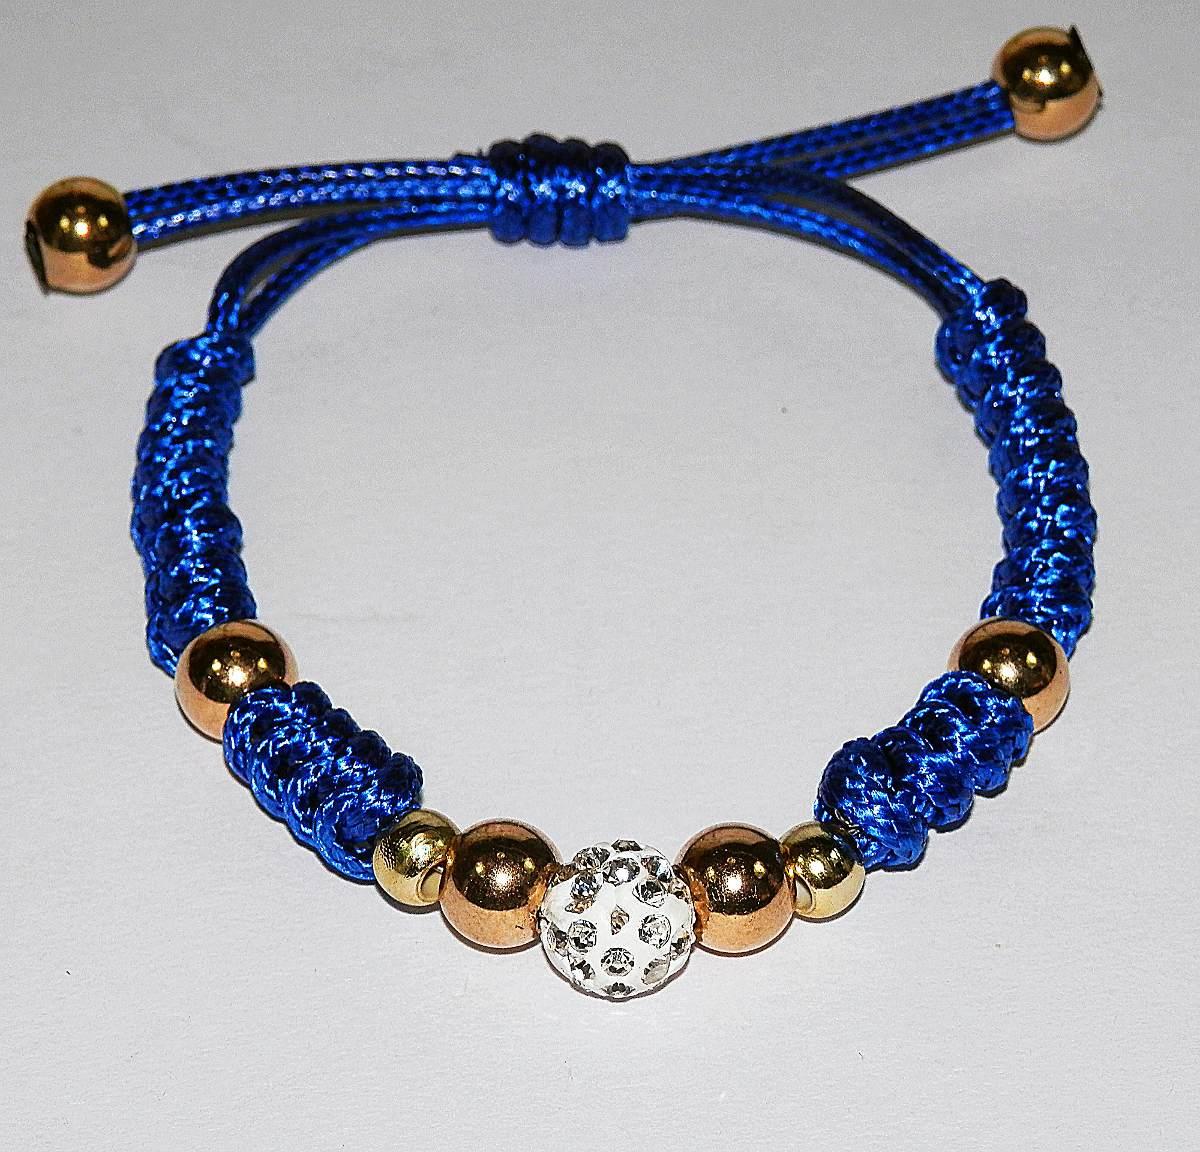 Related: bisuteria al por mayor bisuteria materiales jewelry anillos collares beads relojes de mujer bisuteria acero inoxidable pulseras bisuteria de mujer Include description Categories.